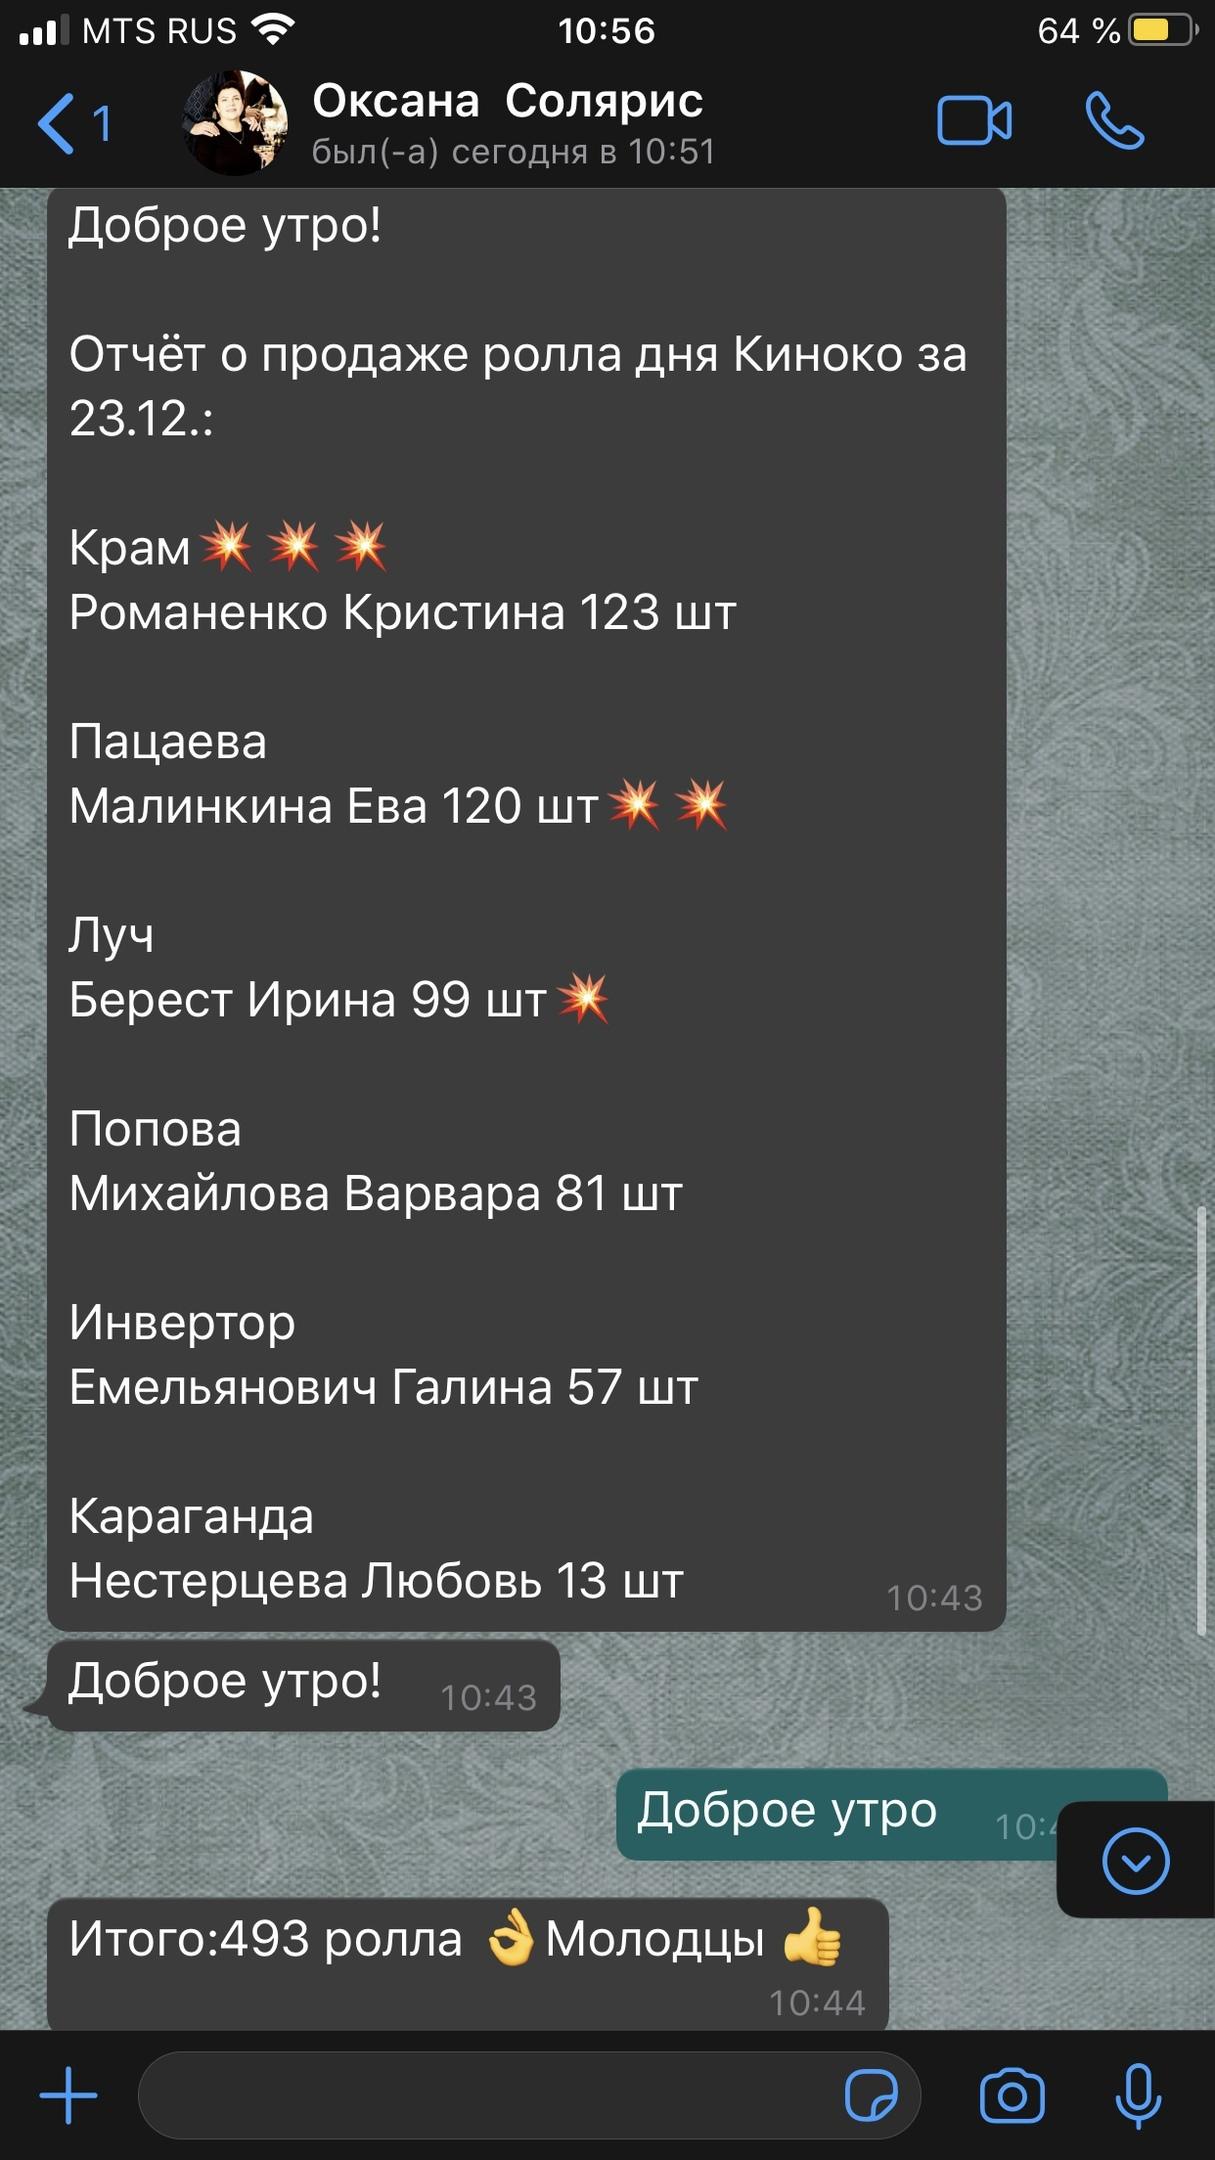 отчет по продаже акционного ролла за 23.12.20